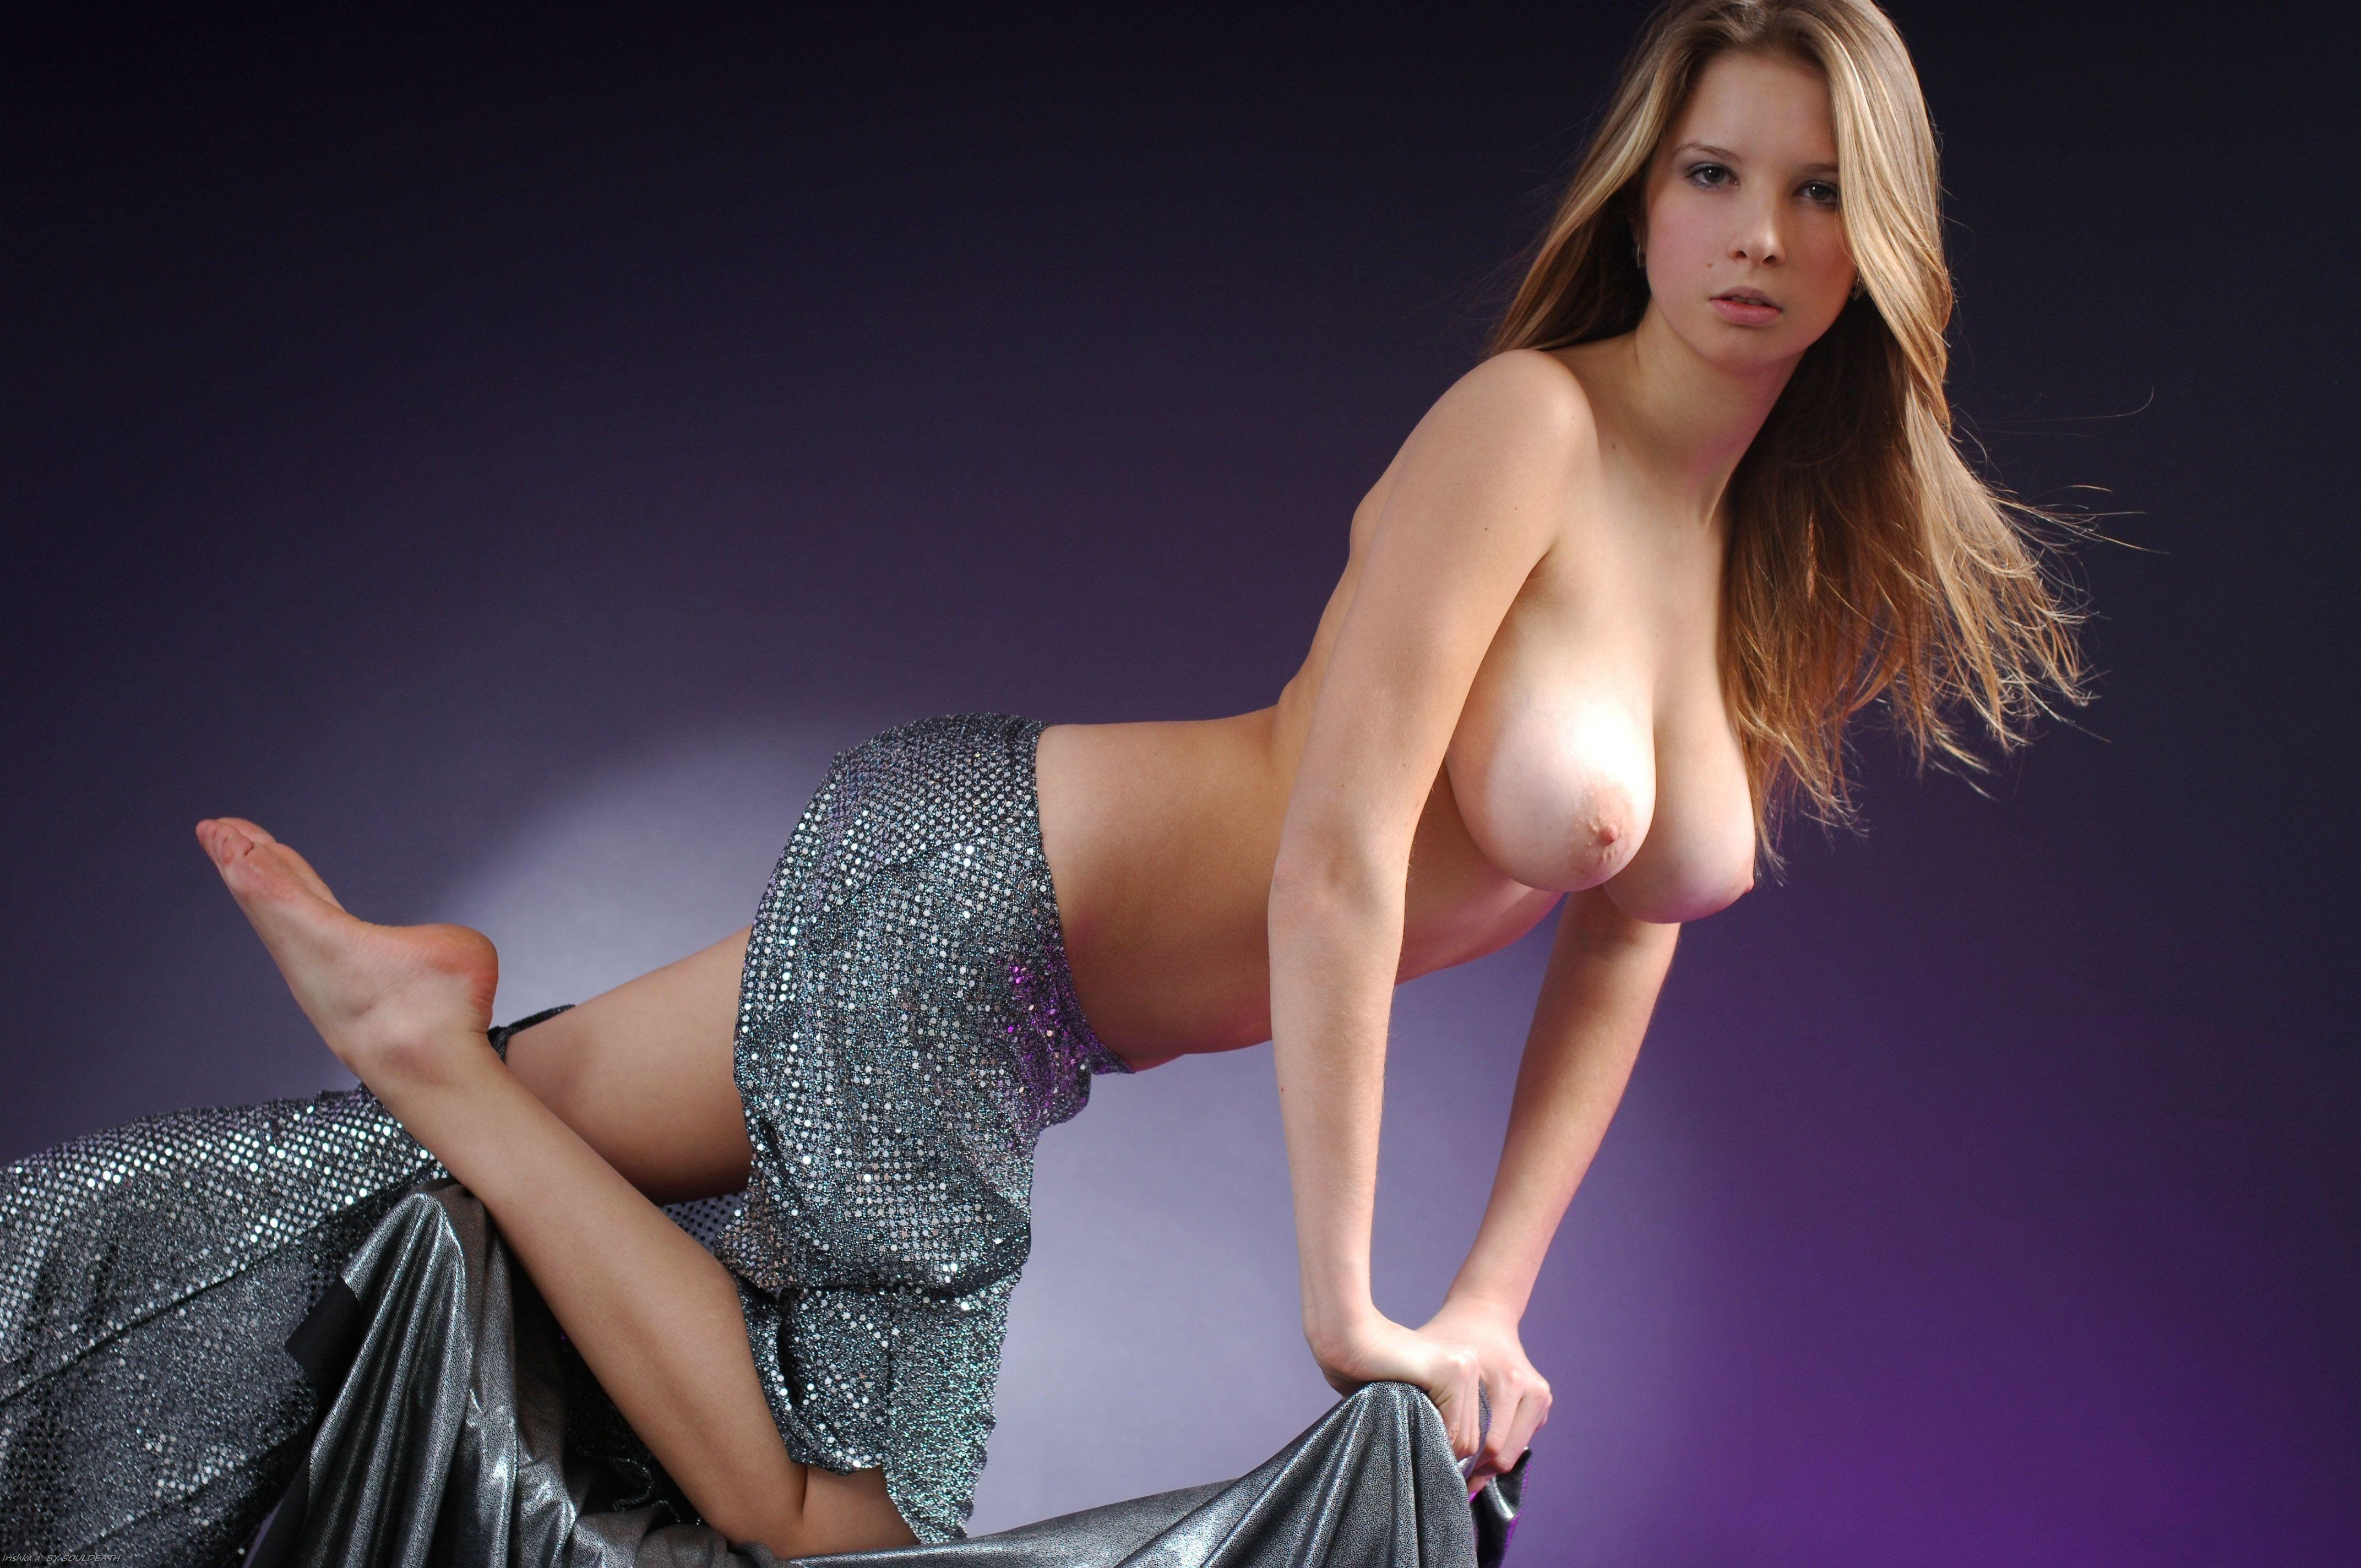 Emma watson mini skirt